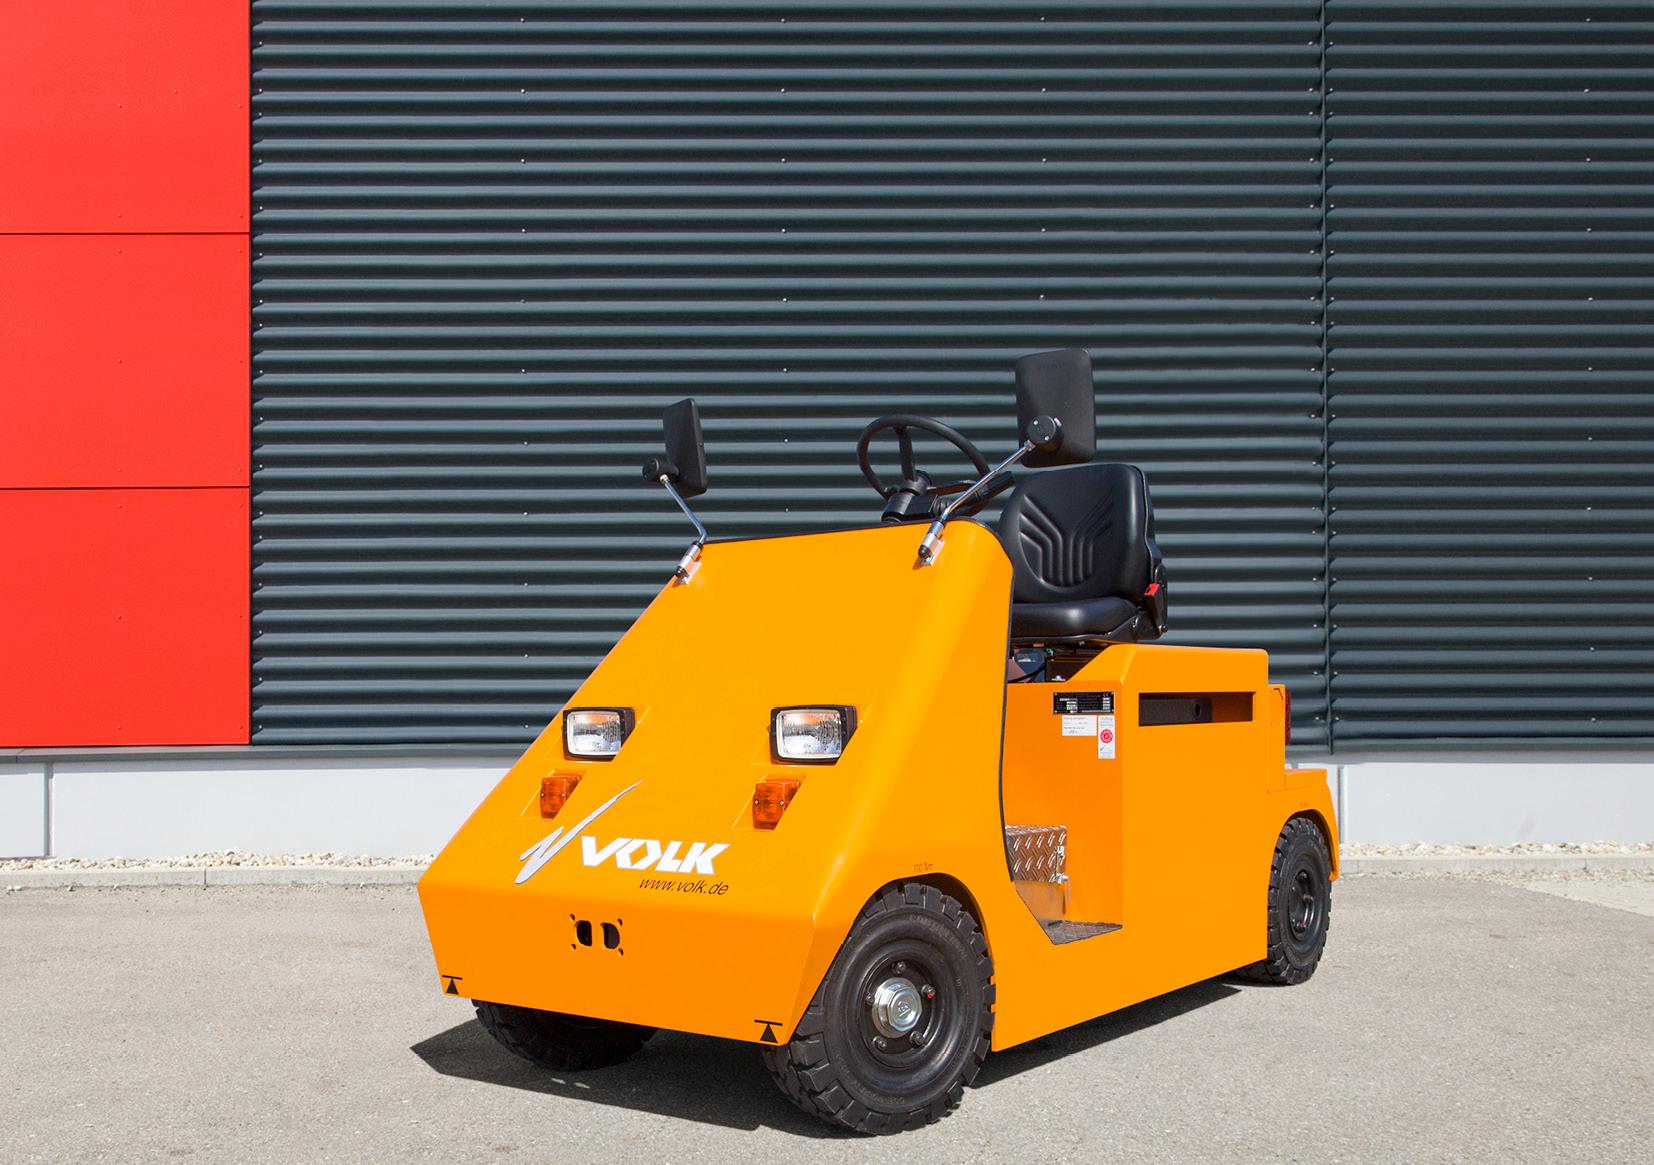 VOLK Electric tow tractor EFZ 20 K